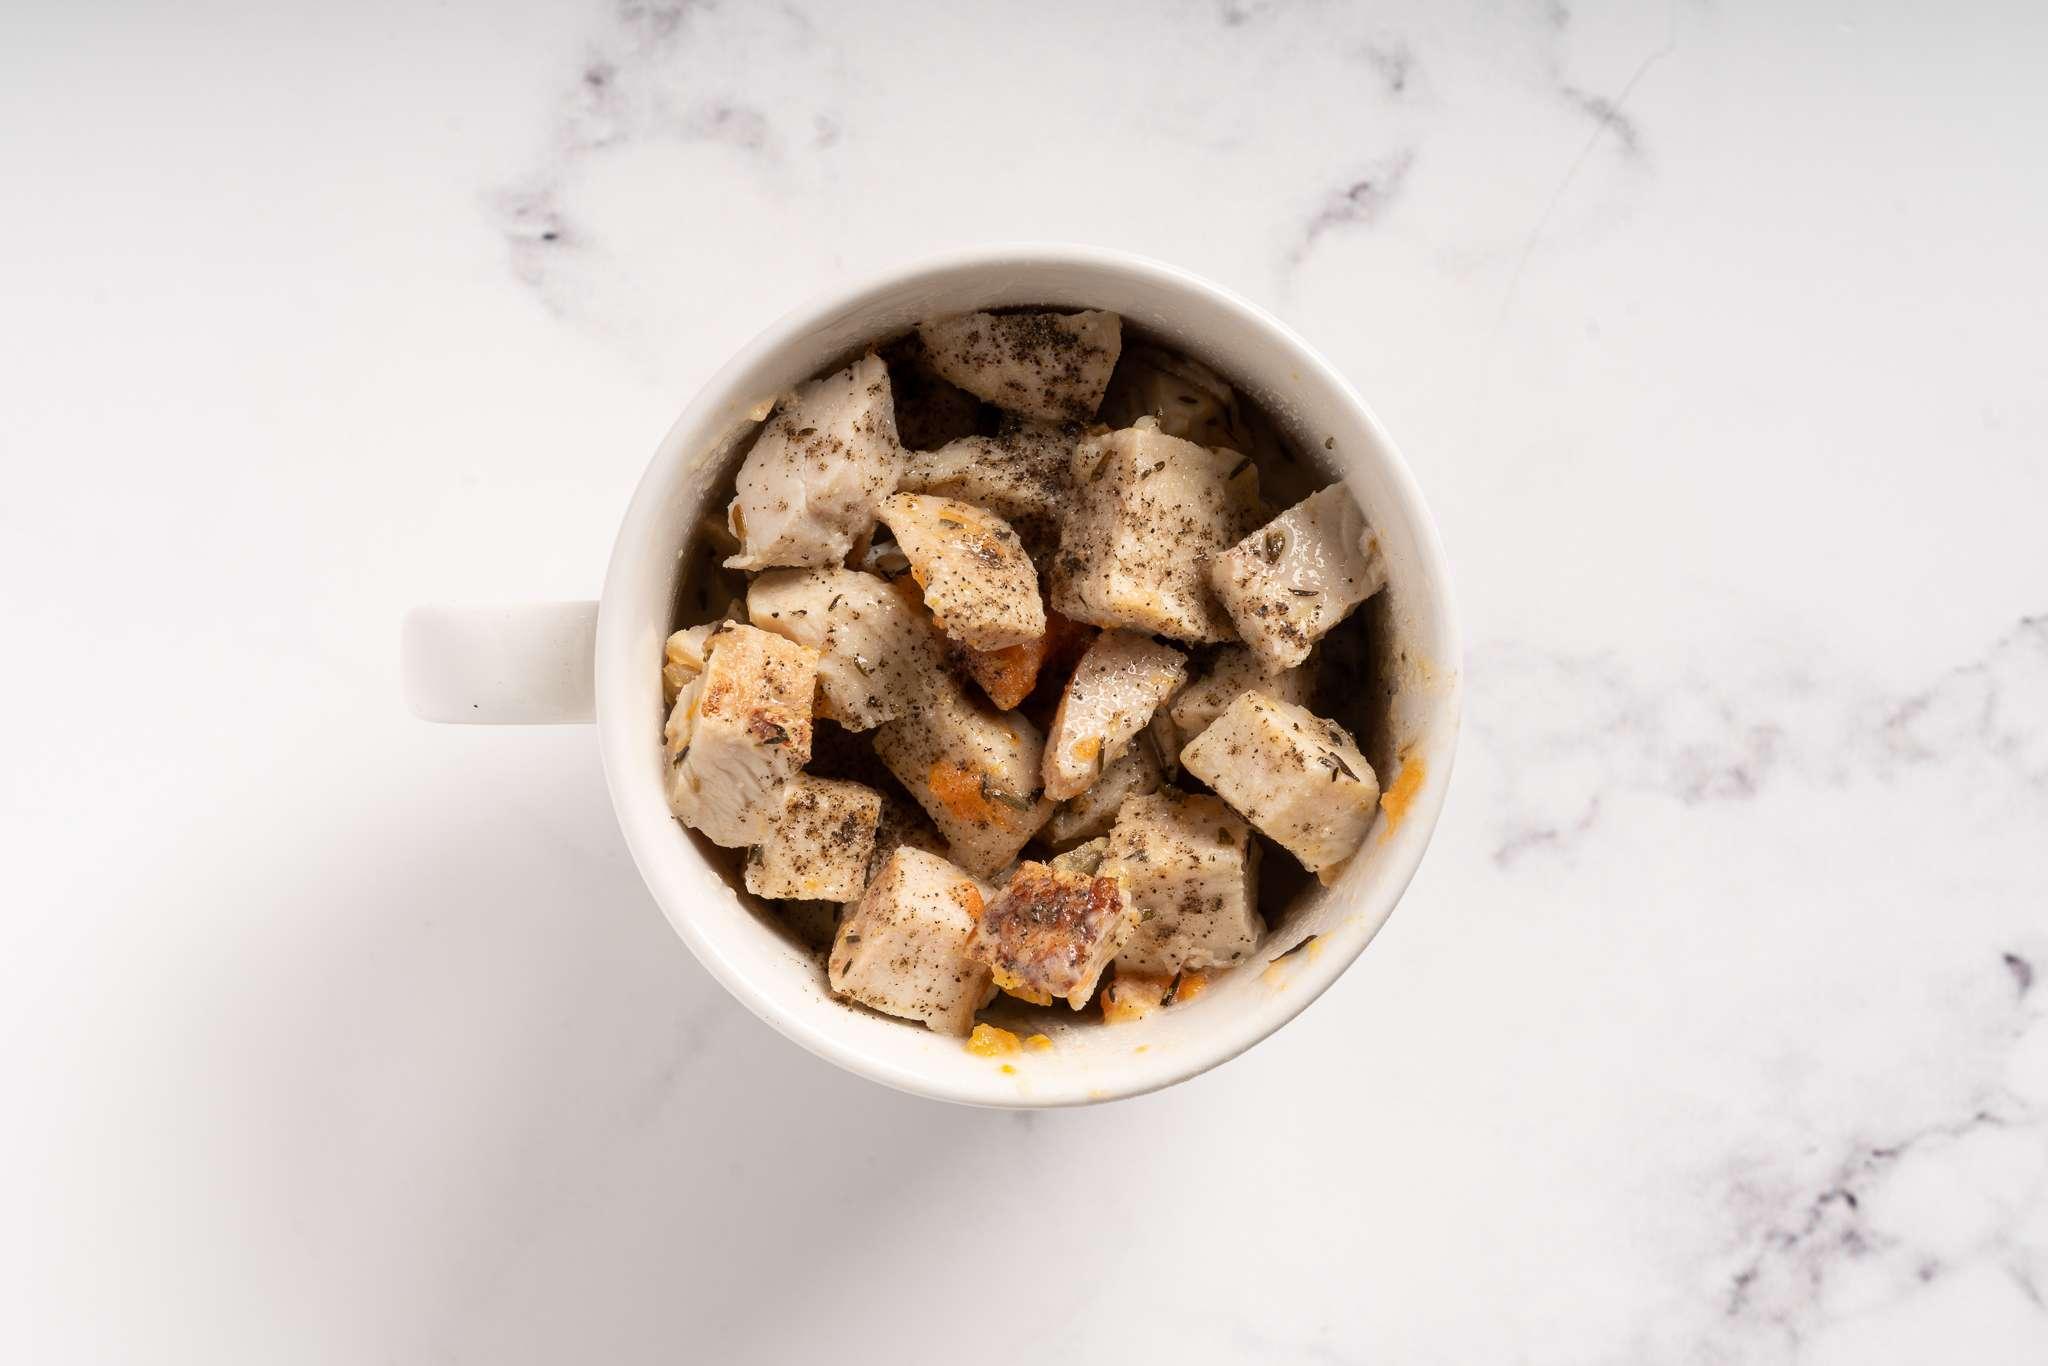 Chicken Pot Pie filling in a Mug